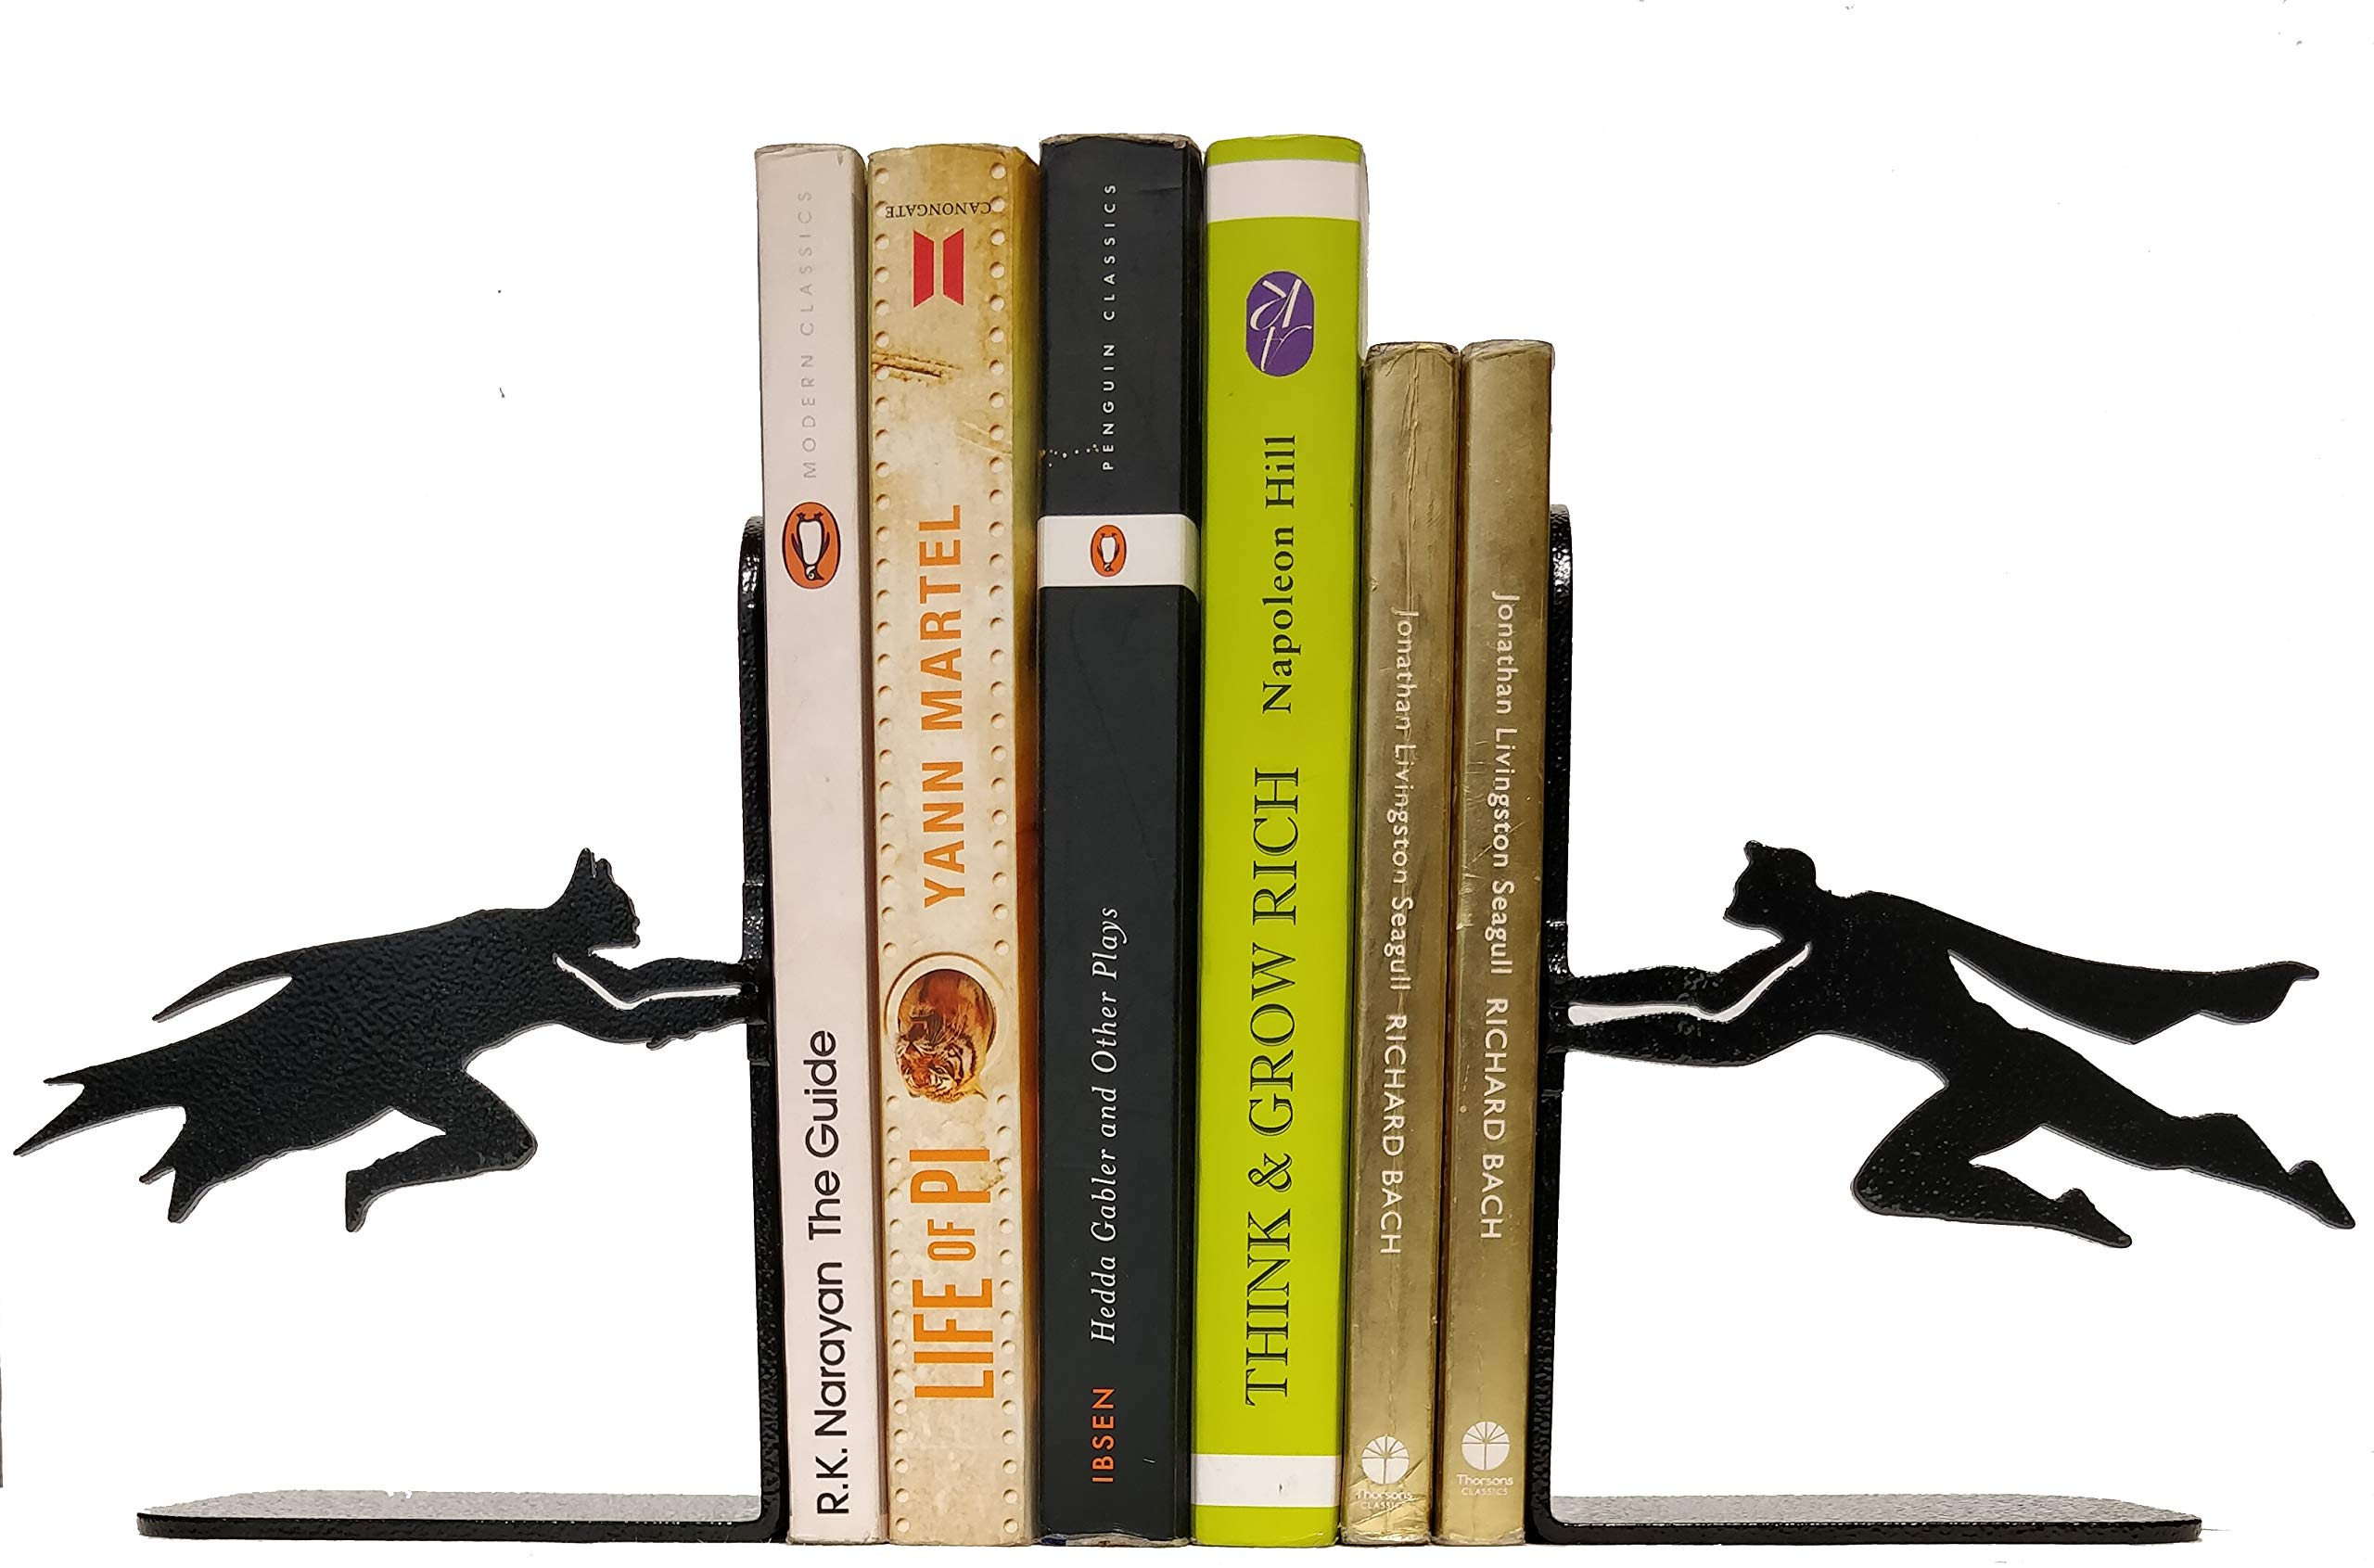 HeavenlyKraft Superheros Decorative Metal Bookend, Non Skid Book End, Book Stopper for Home/Office Decor/Shelves, Children Room Décor, 5.9 X 3.9 X 3.14 Inch Per Piece (Weight 2.5 Pound/Pair)